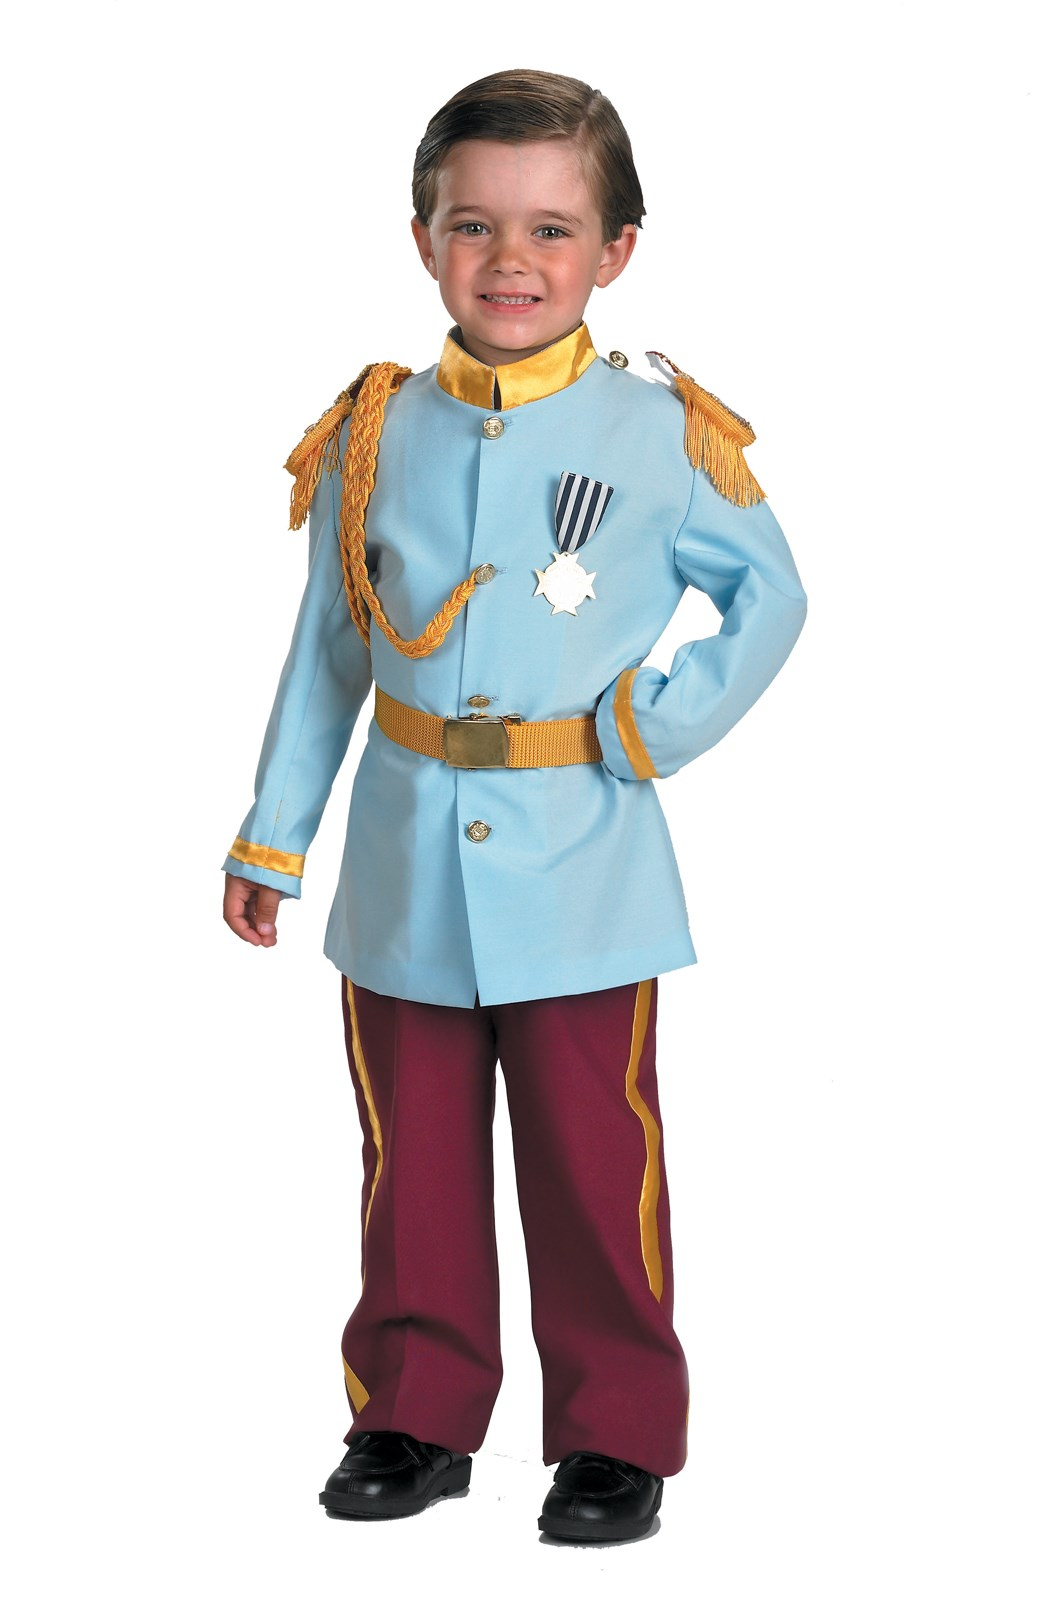 Prince Charming Child Costume | BirthdayExpress.com